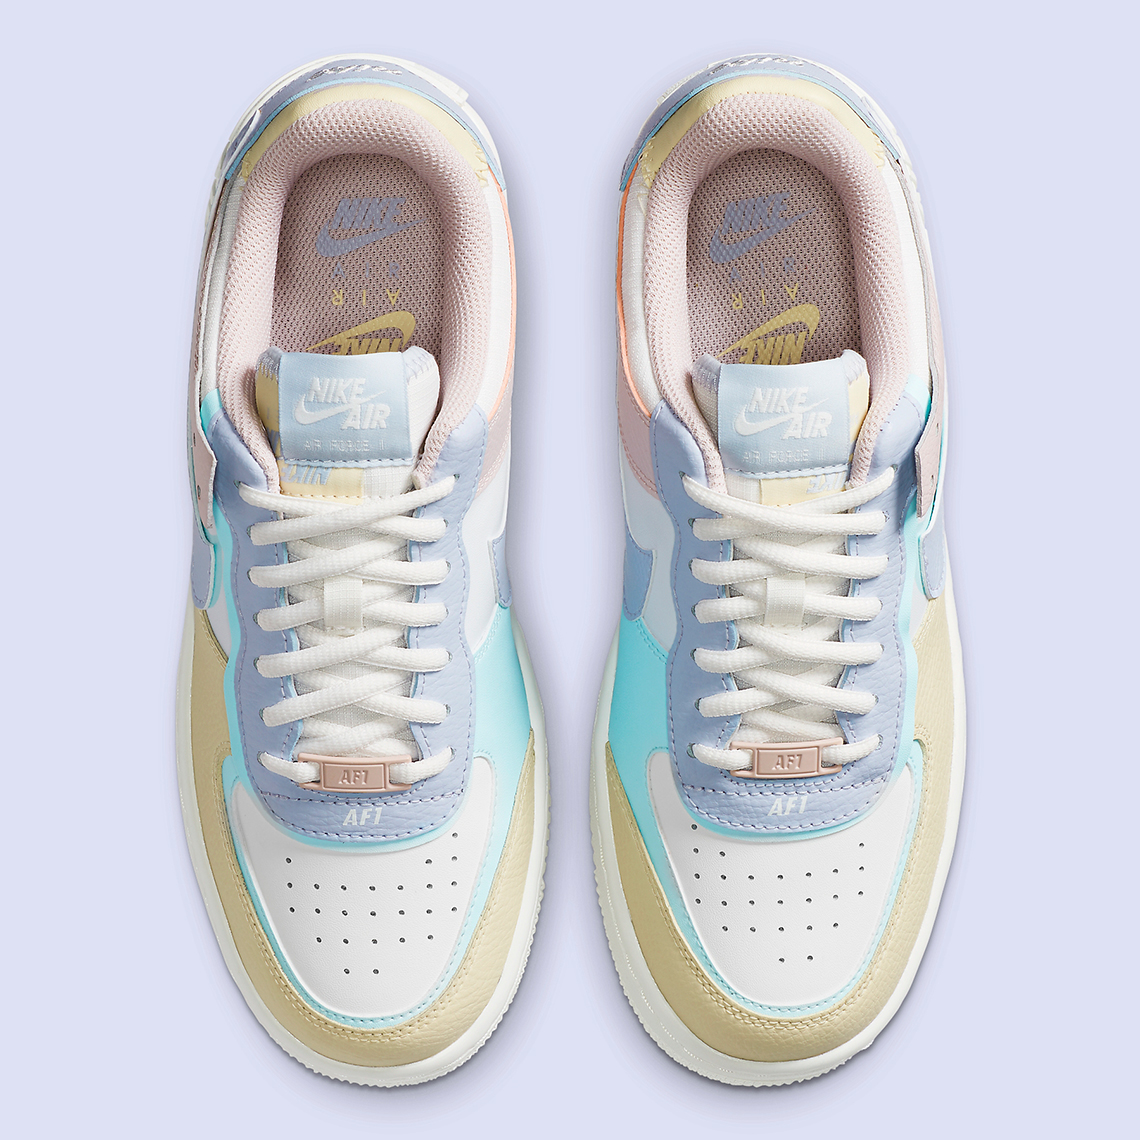 Nike Air Force 1 Shadow CI0919-106 | SneakerNews.com